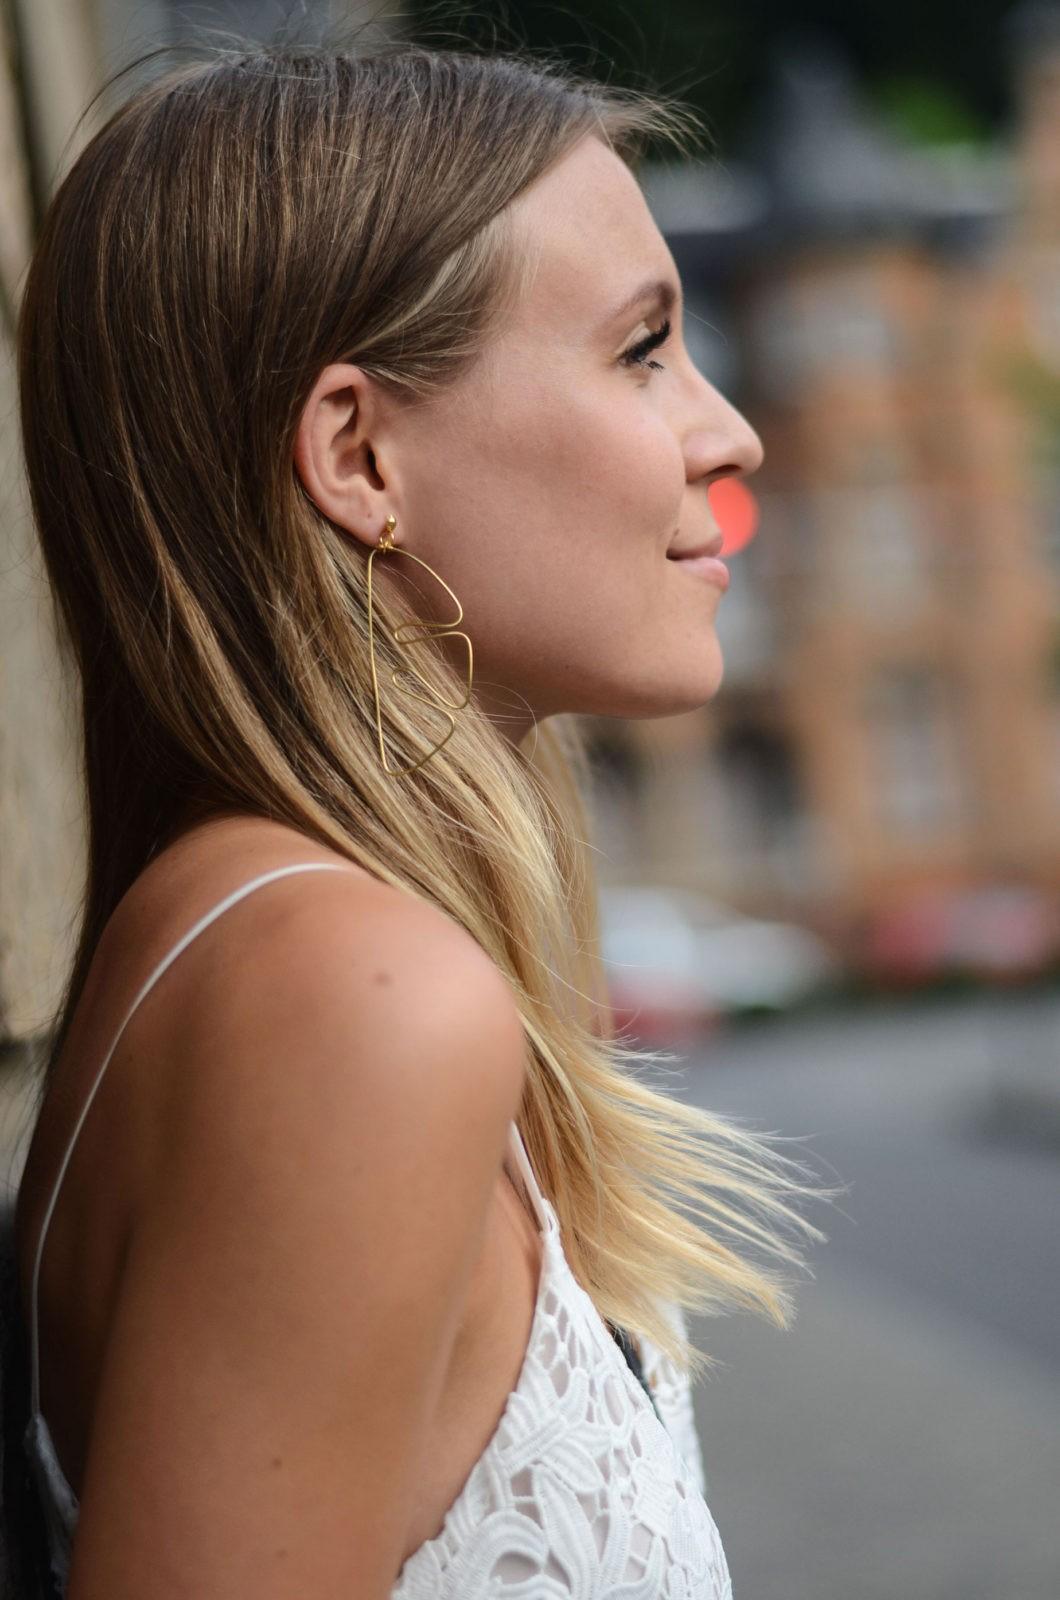 Sariety-modeblog-heidelberg-sarah-czok-fashionblogger-zara-spitzenkleid-superga-aldo-bag-10